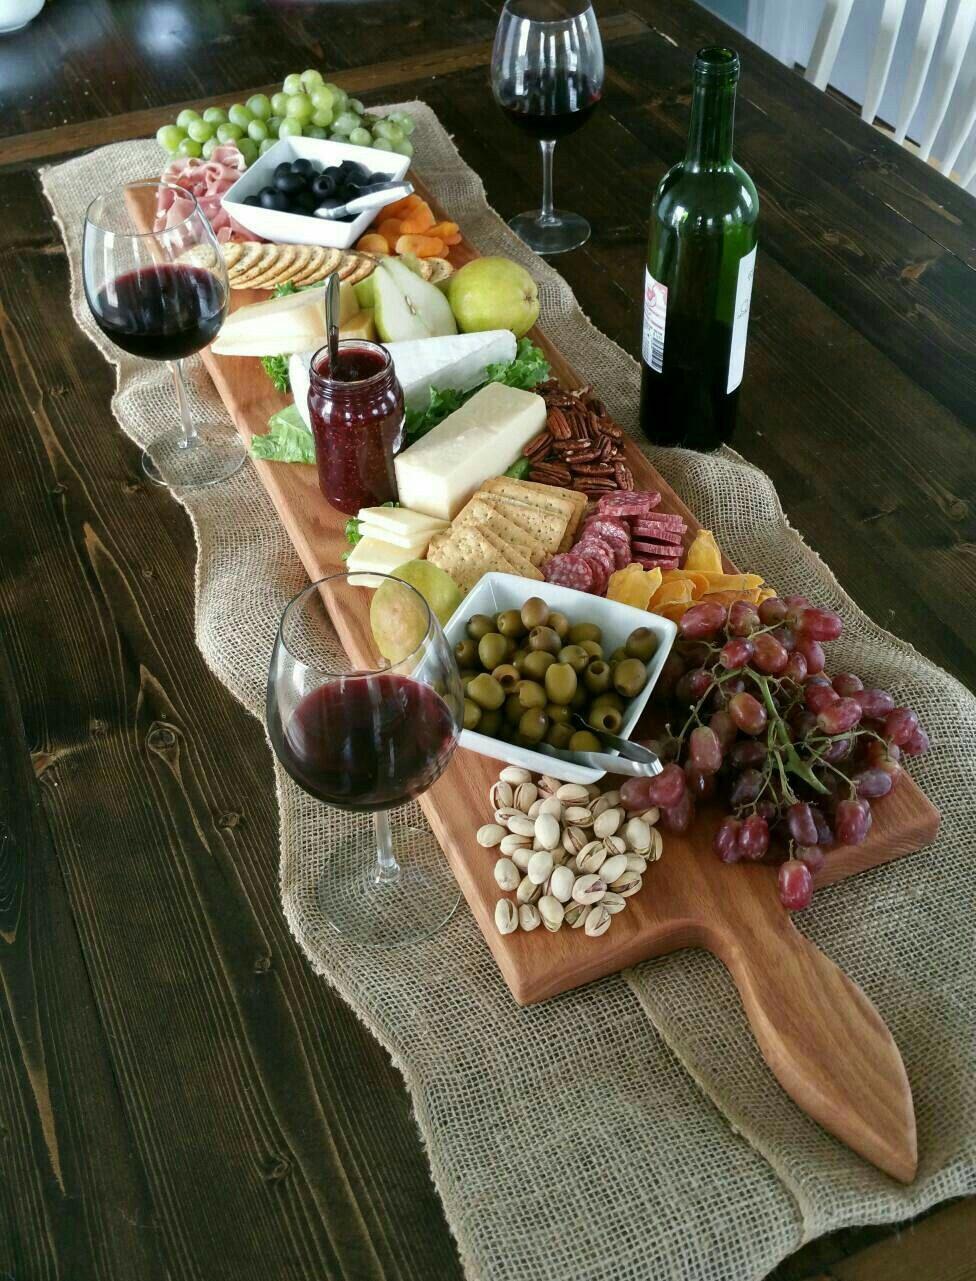 Pingl par stephanie sur cheeseboards pinterest recettes for Idee repas reception amis